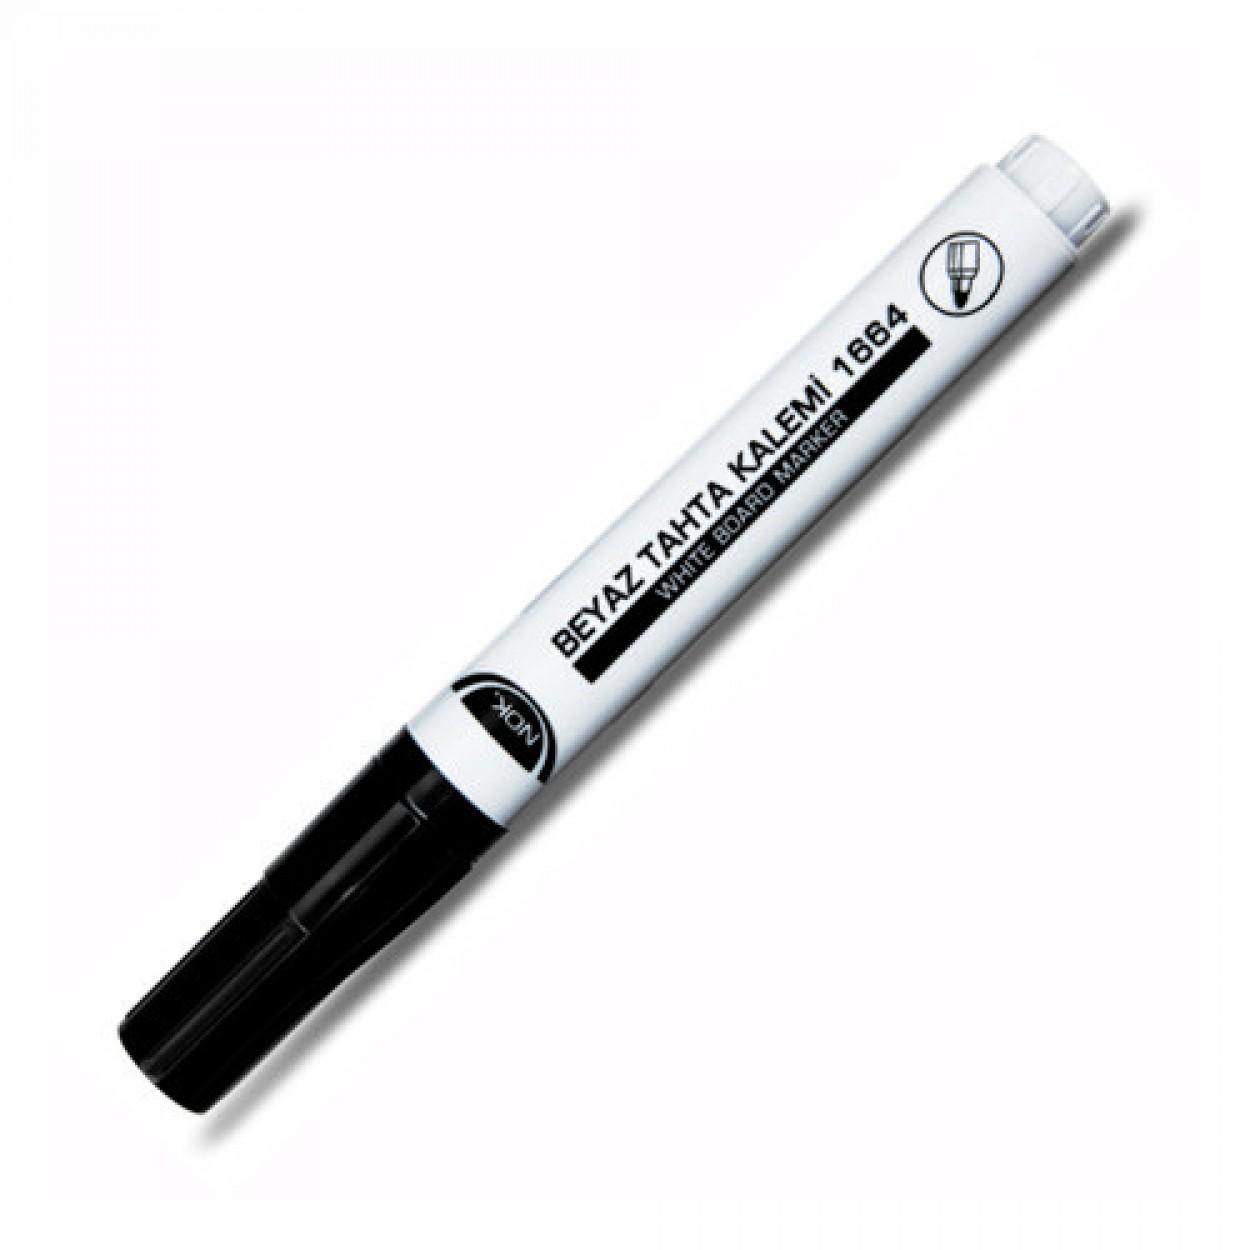 Noki Beyaz Tahta Kalemi Siyah